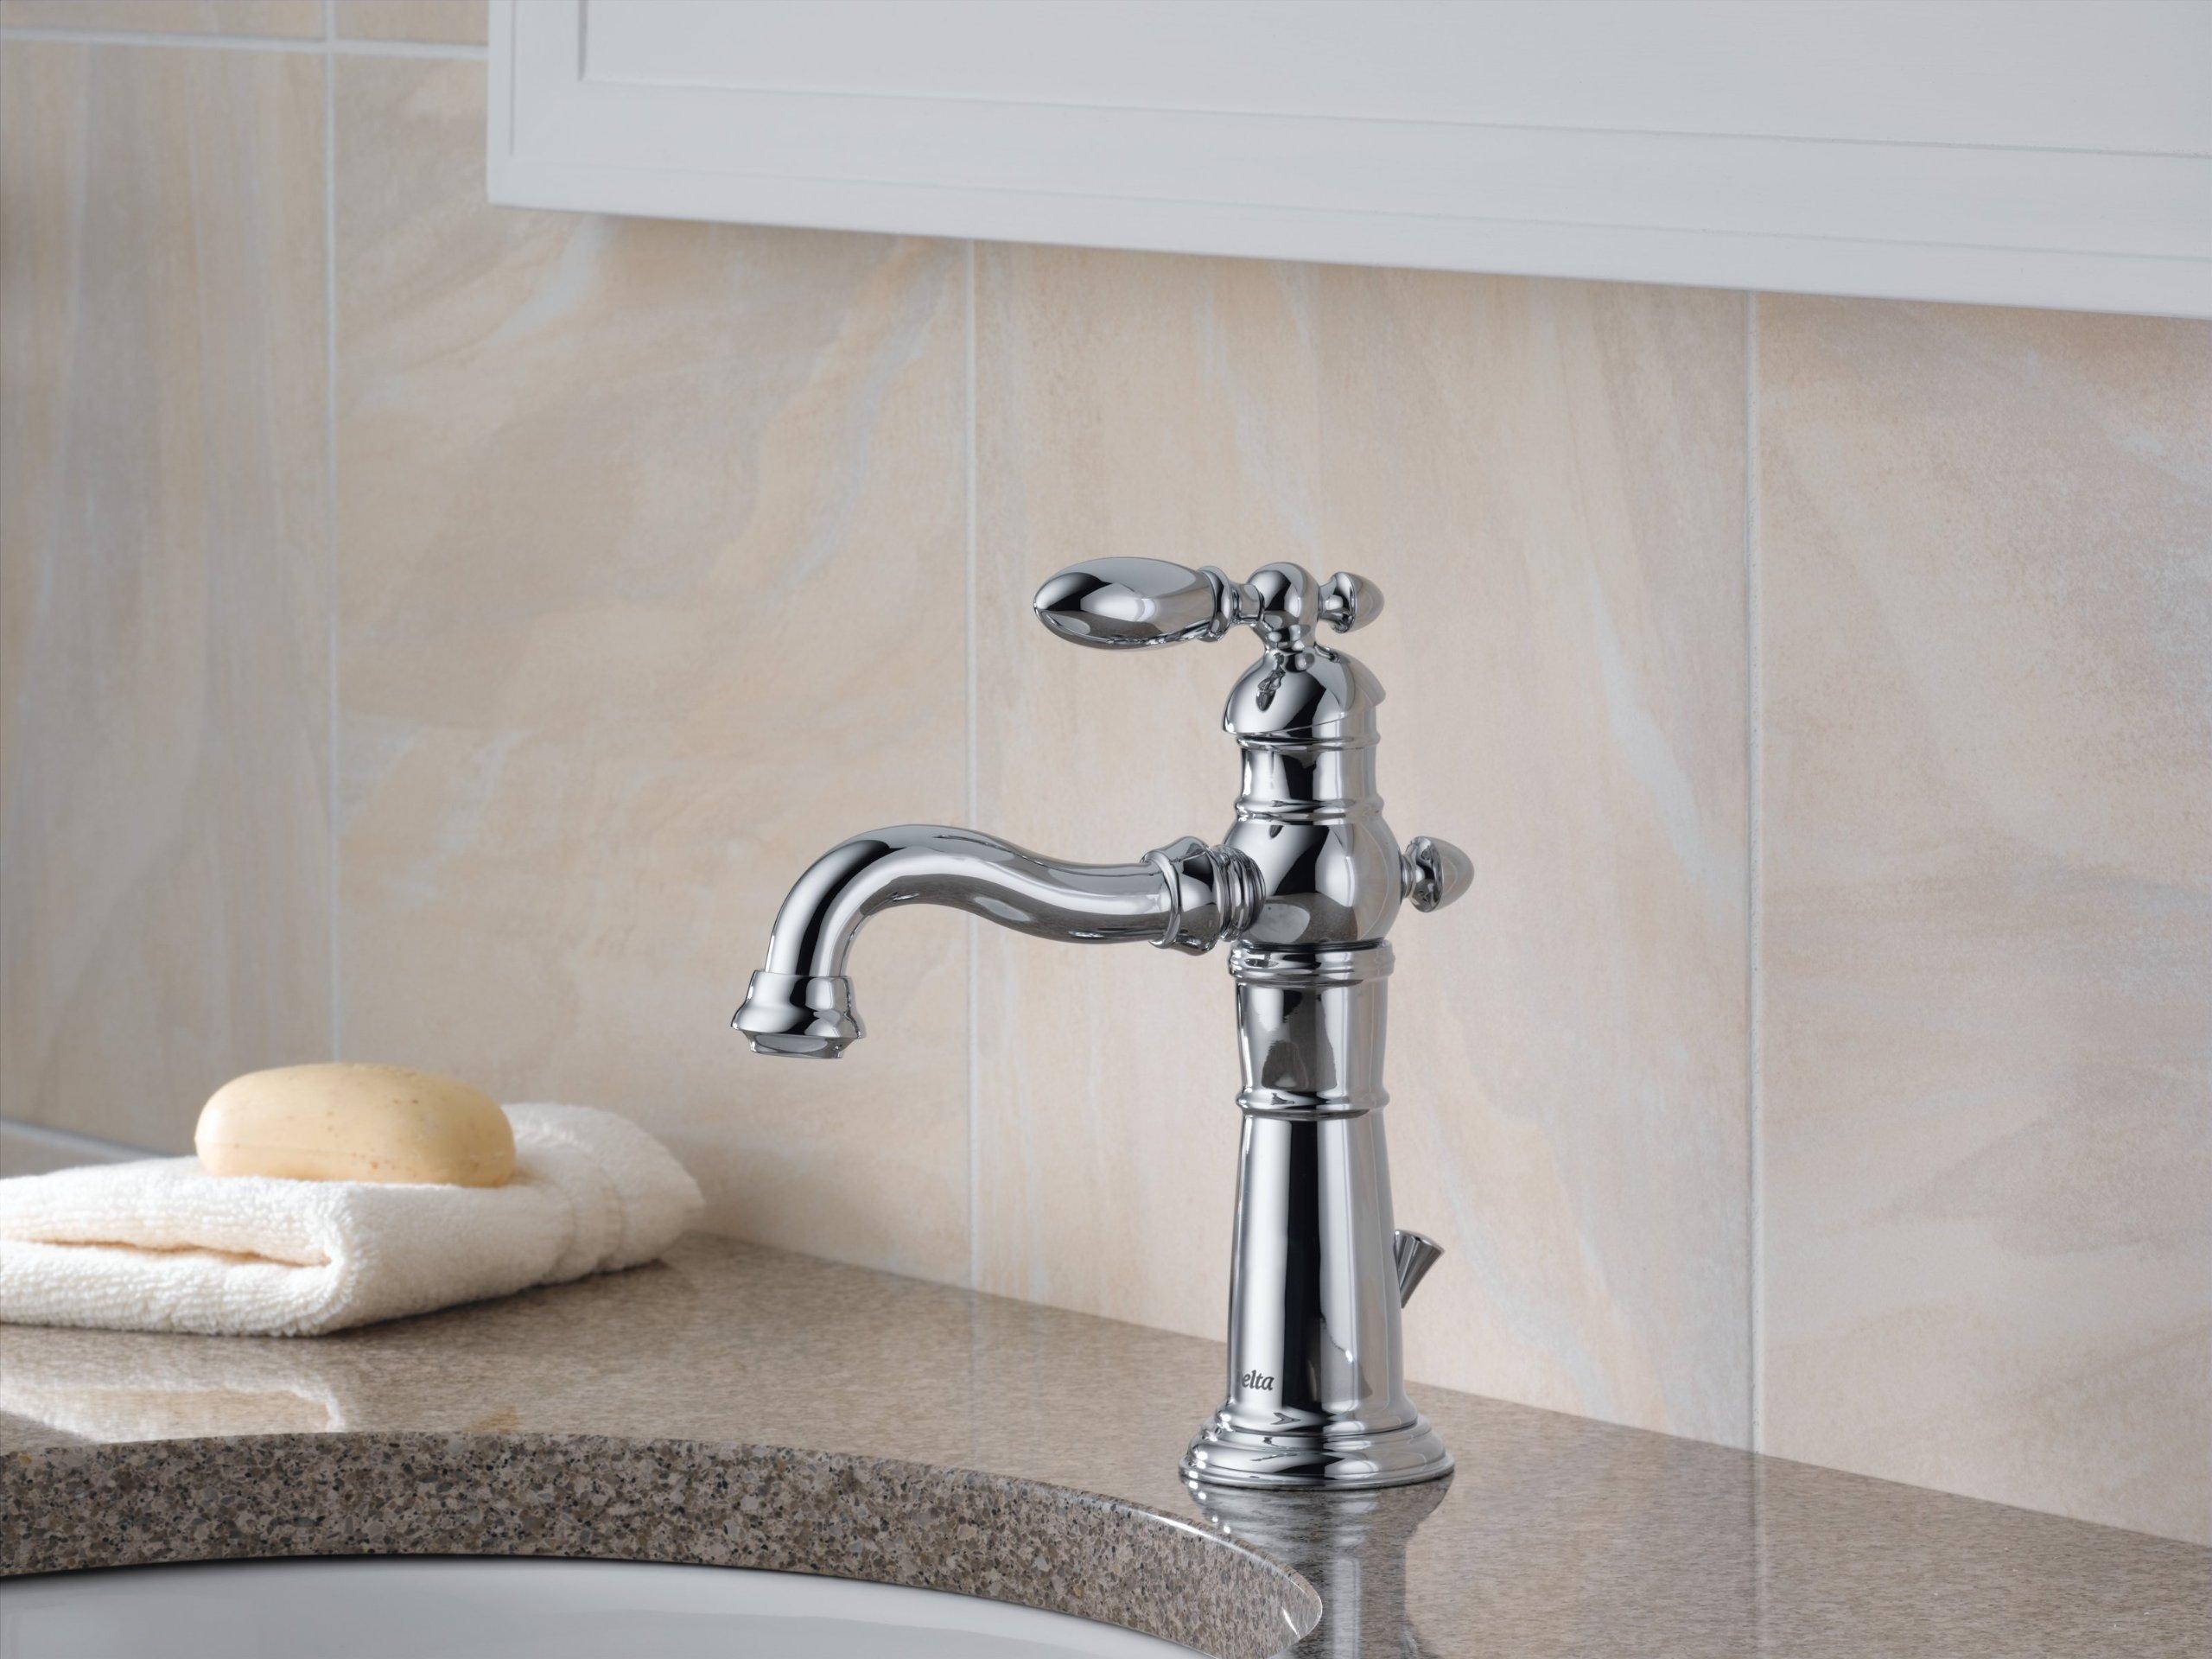 Delta Victorian 555lf Single Handle Centerset Bathroom: Delta 555LF Victorian Single Handle Centerset Bathroom